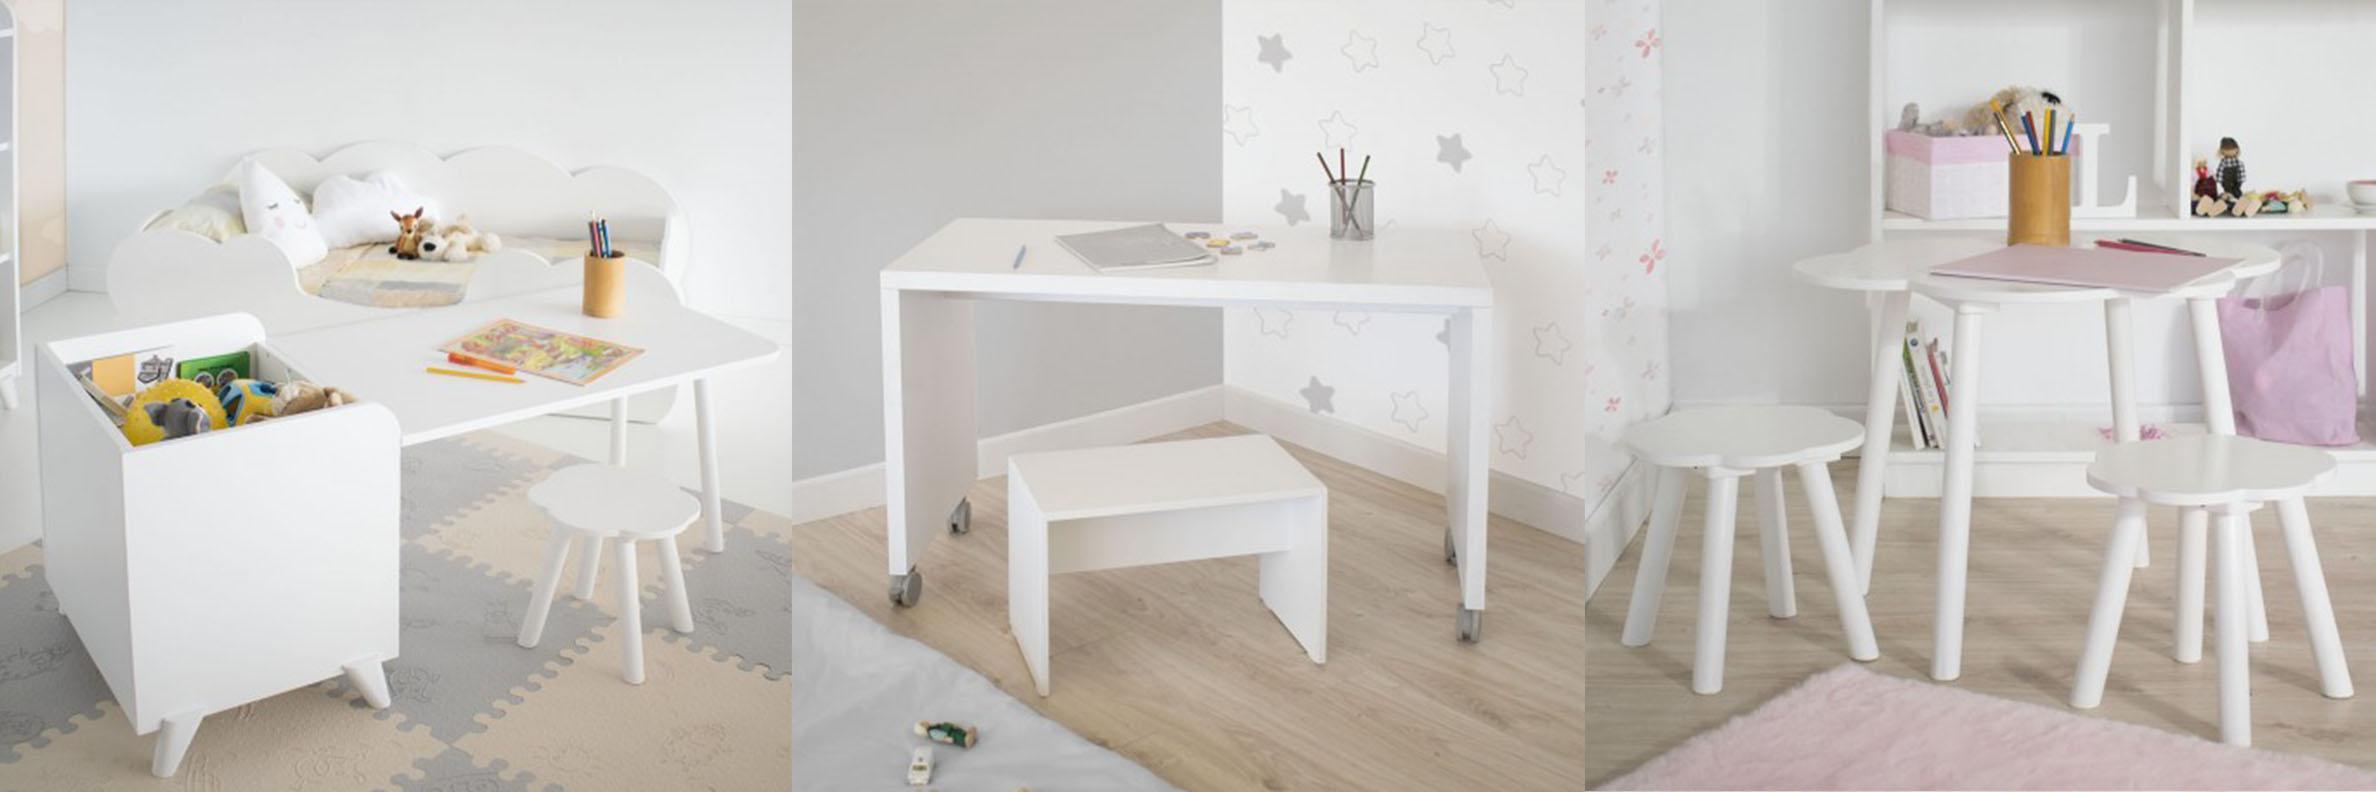 Mesas y jugueteros Montessori Bainba